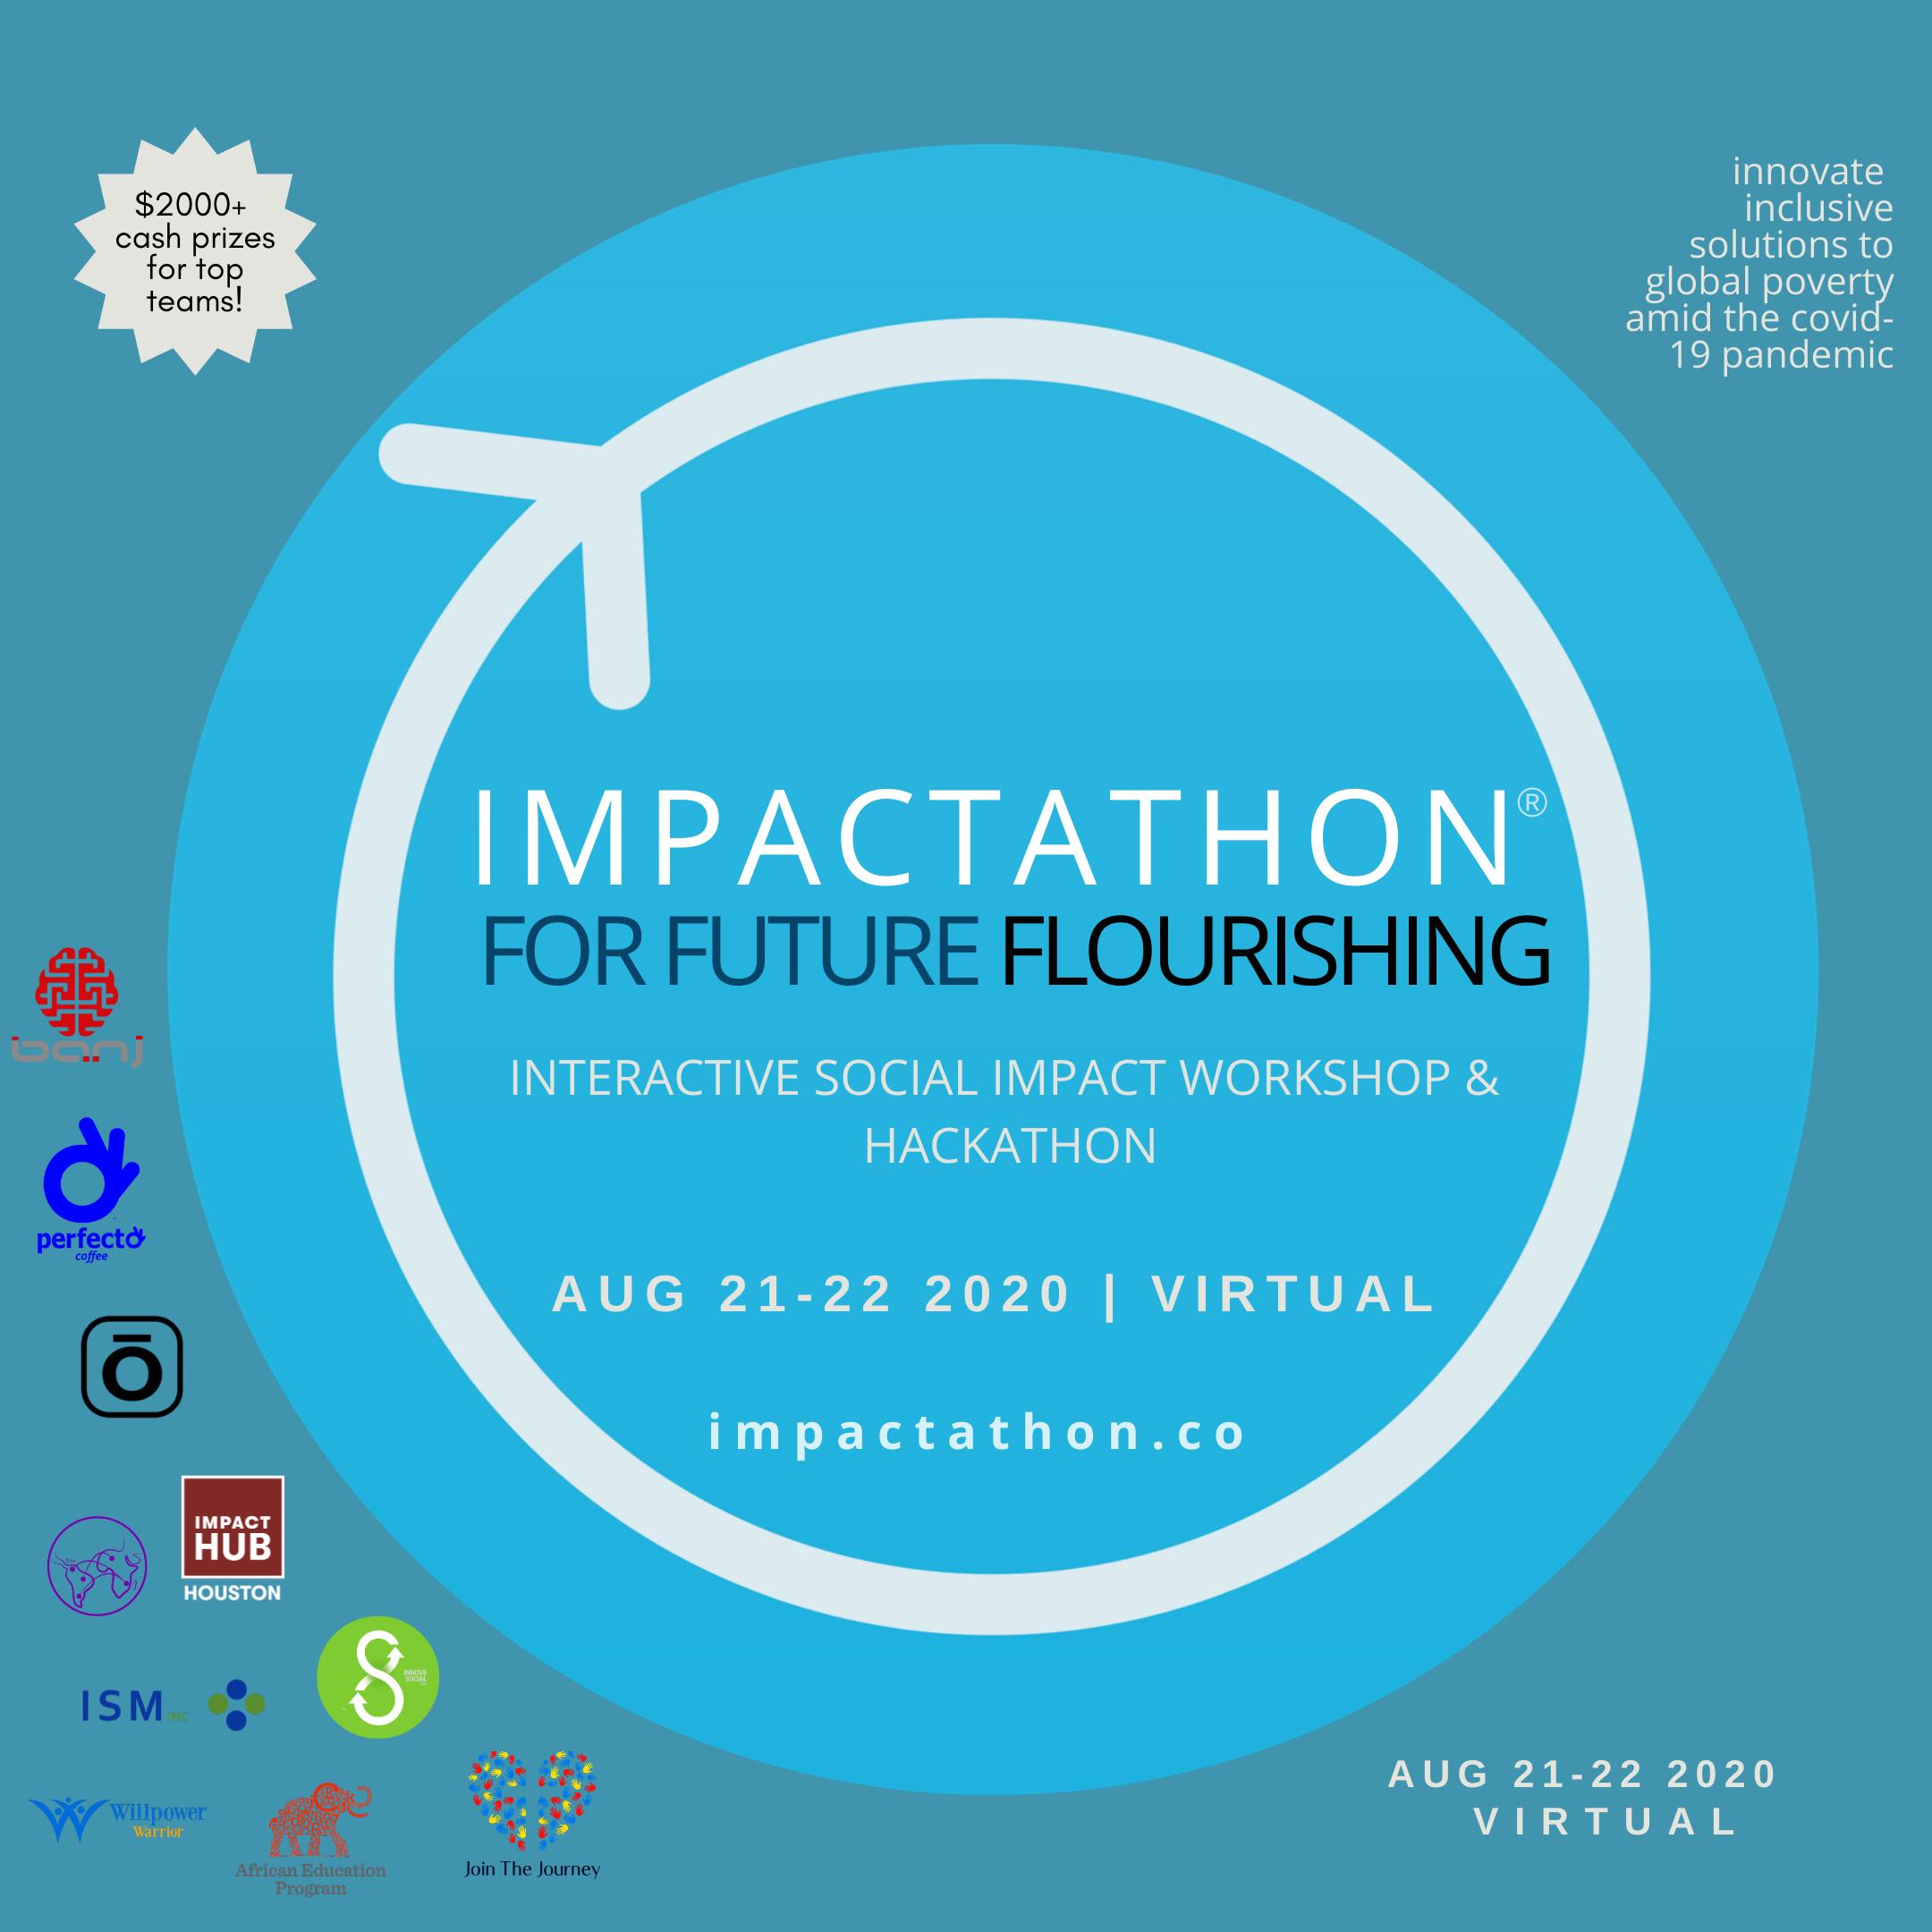 Impactathon for Future Flourishing event image